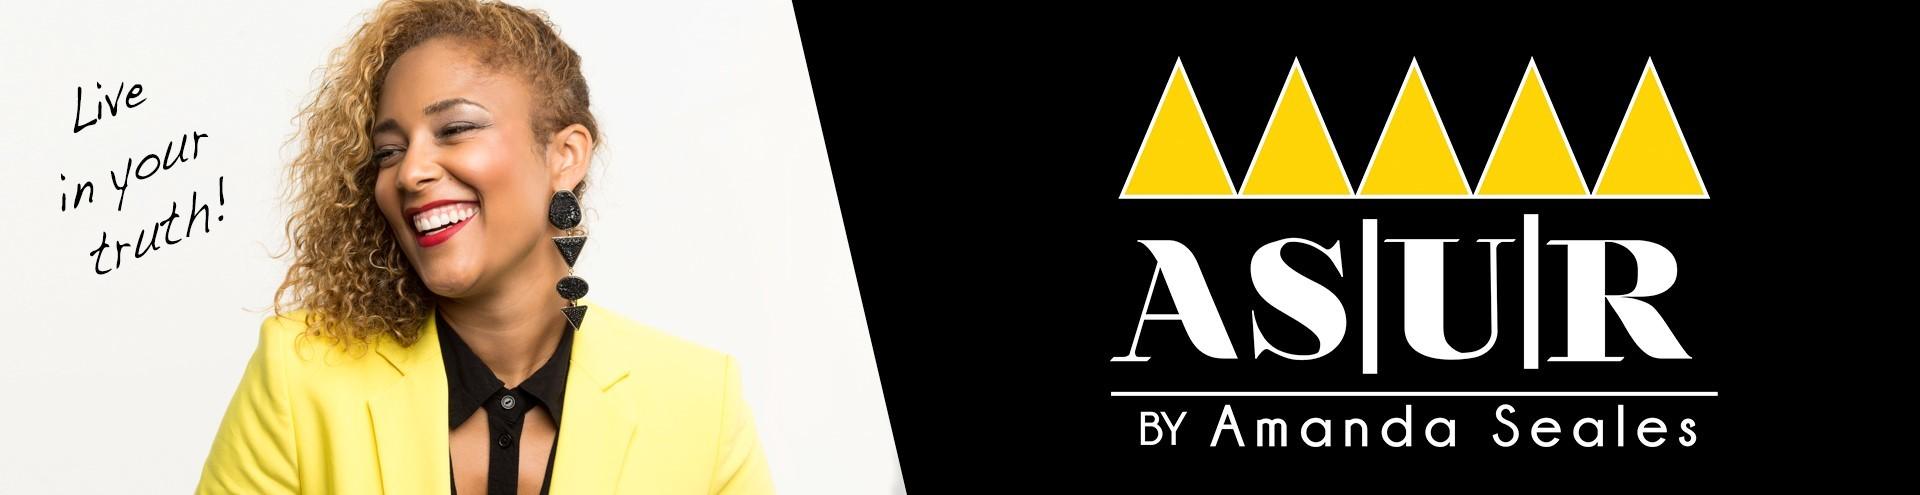 Amanda Seales Official Store Store